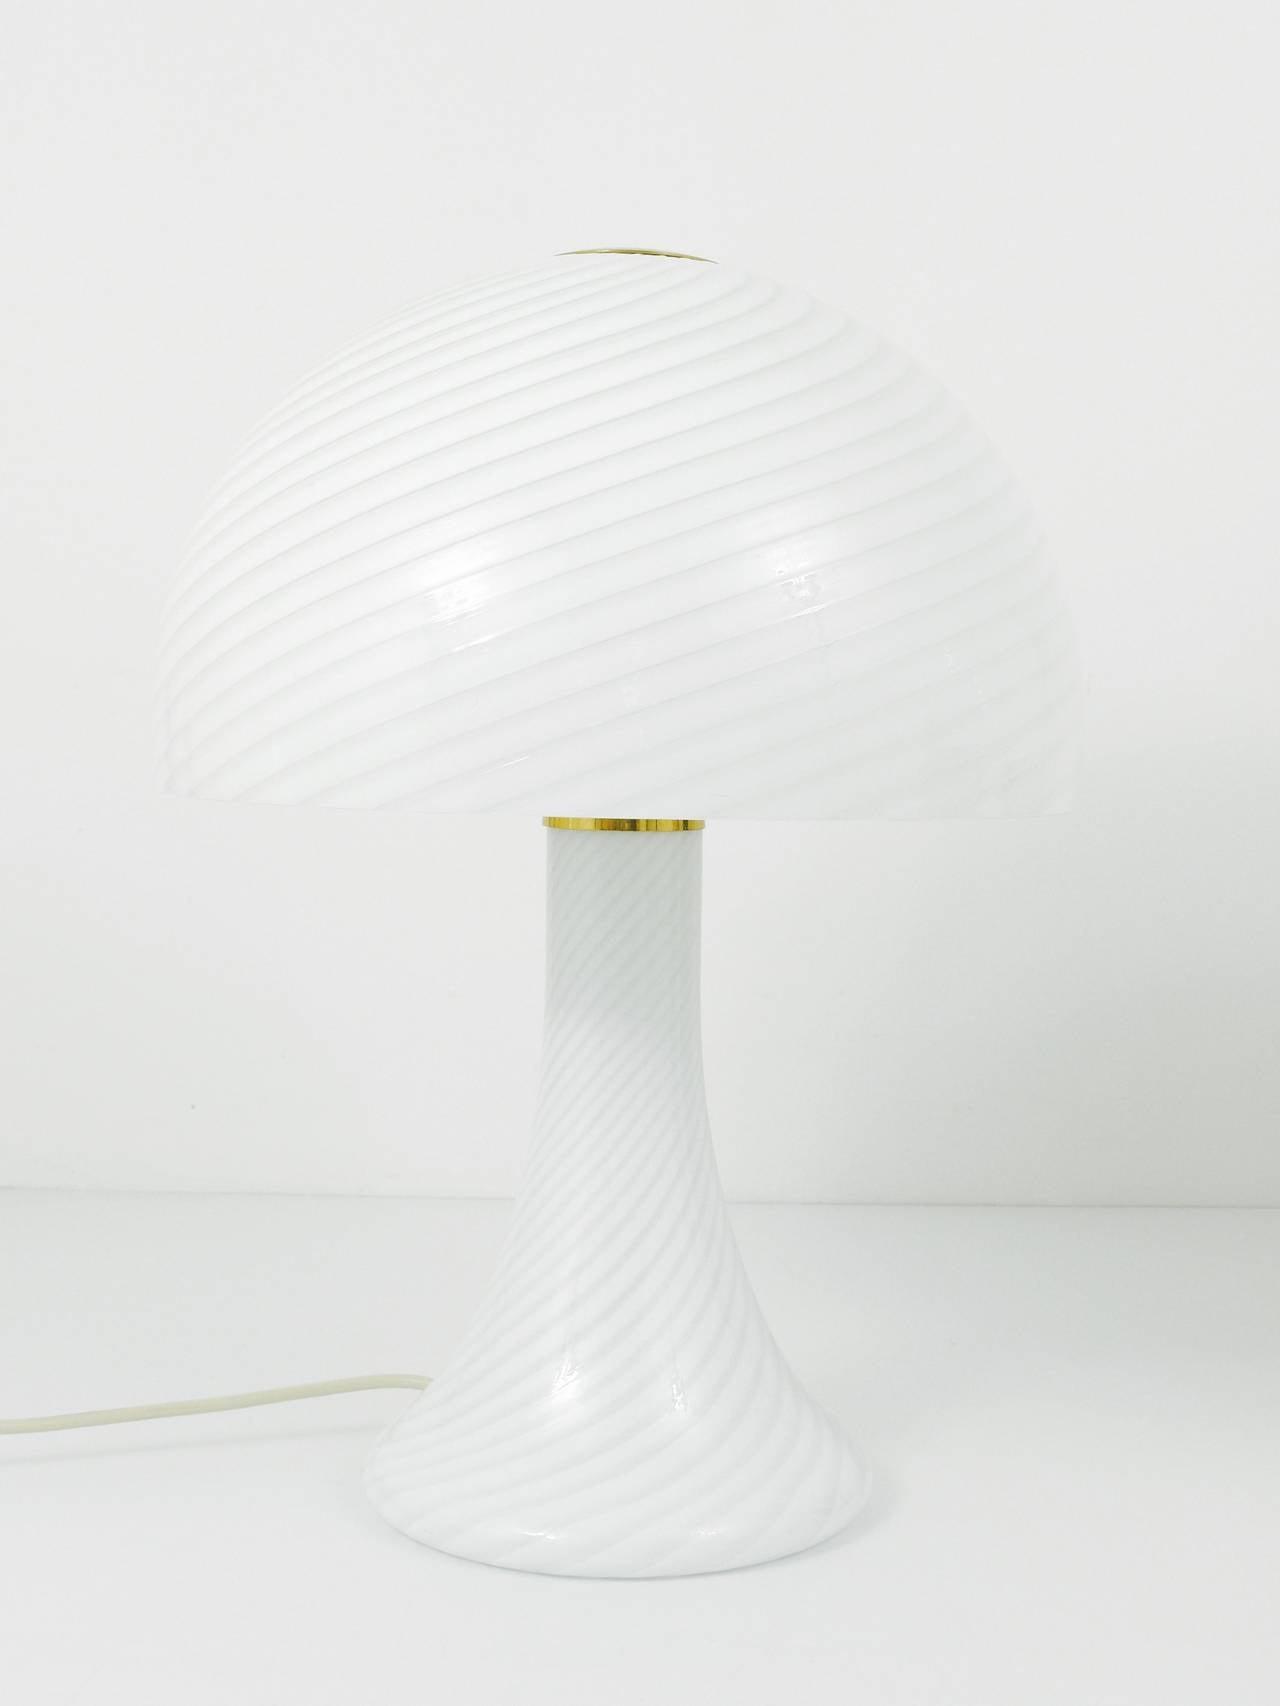 20th Century Pair of Kalmar Murano Glass and Brass Mushroom Lamps by Vistosi, 1960s For Sale